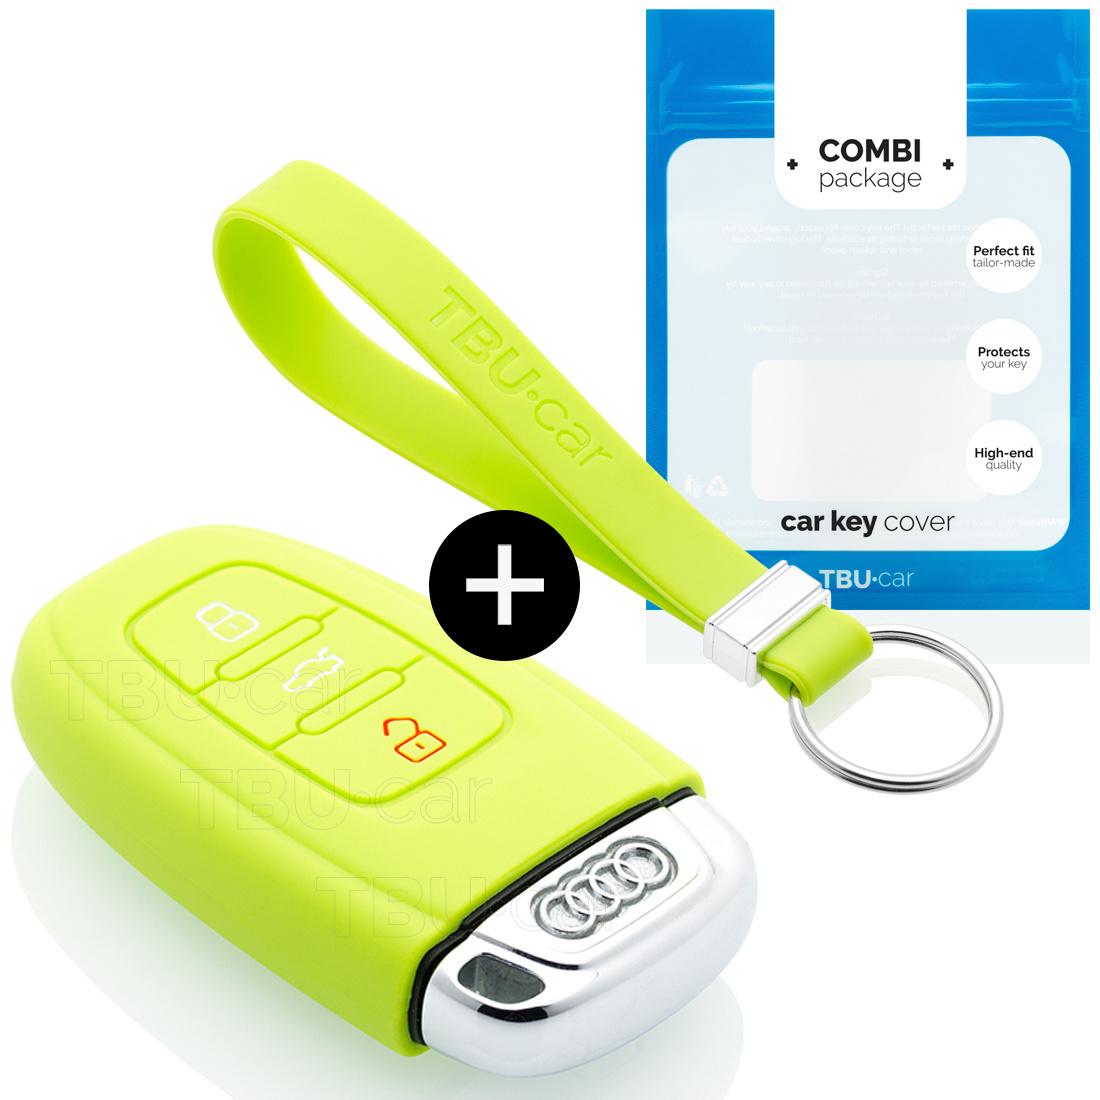 TBU car TBU car Sleutel cover compatibel met Audi - Silicone sleutelhoesje - beschermhoesje autosleutel - Lime groen